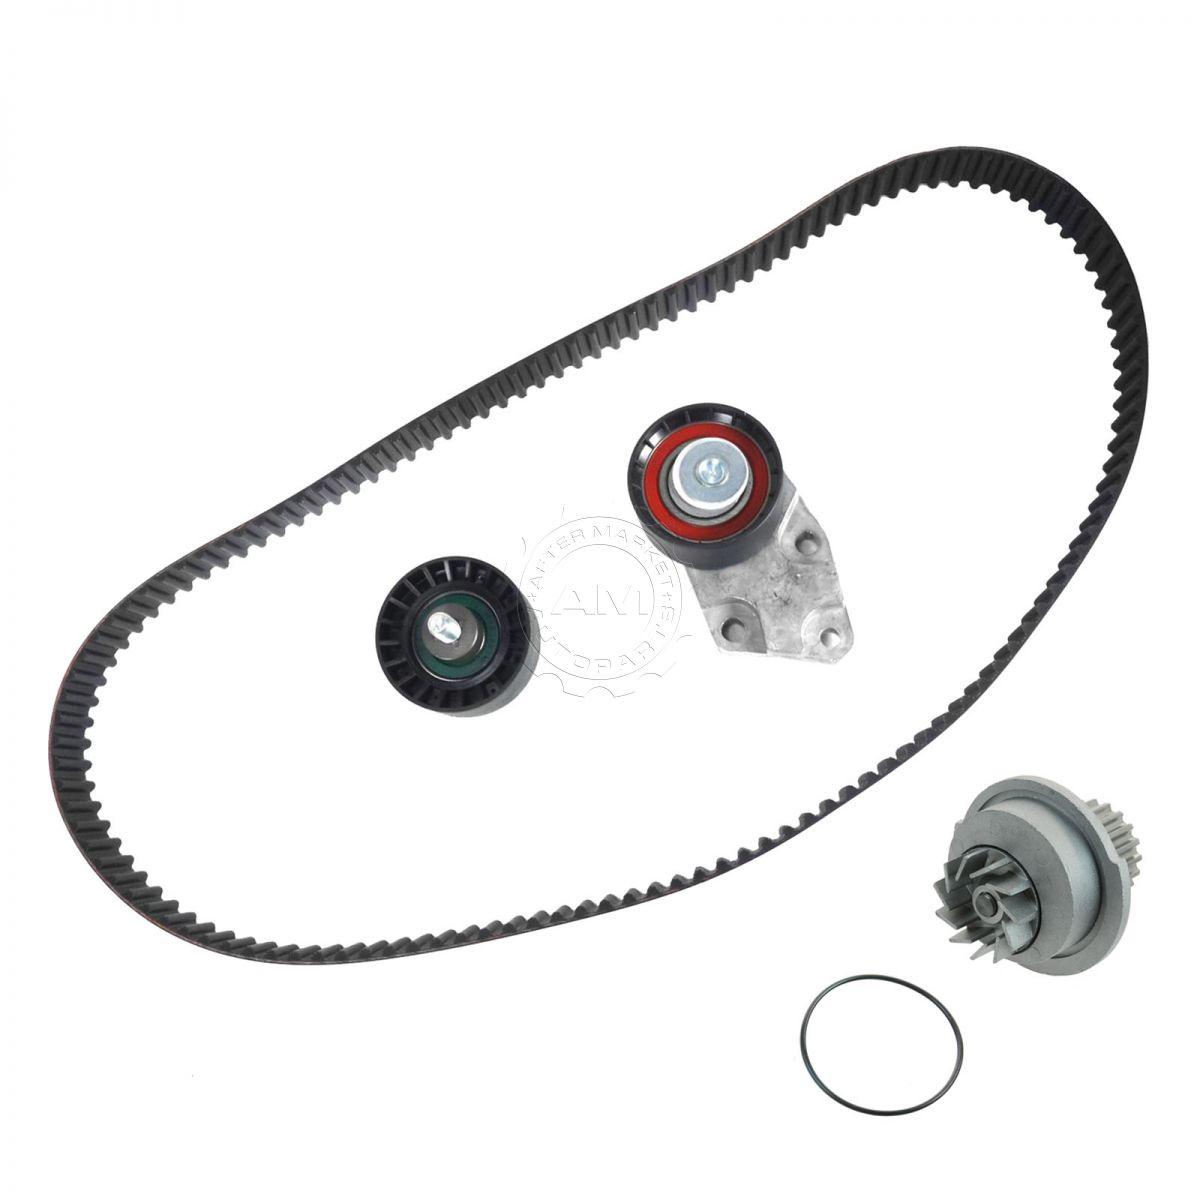 Timing Belt Amp Water Pump Set Kit For Chevy Aveo Aveo5 Pontiac Wave Suzuki Swift